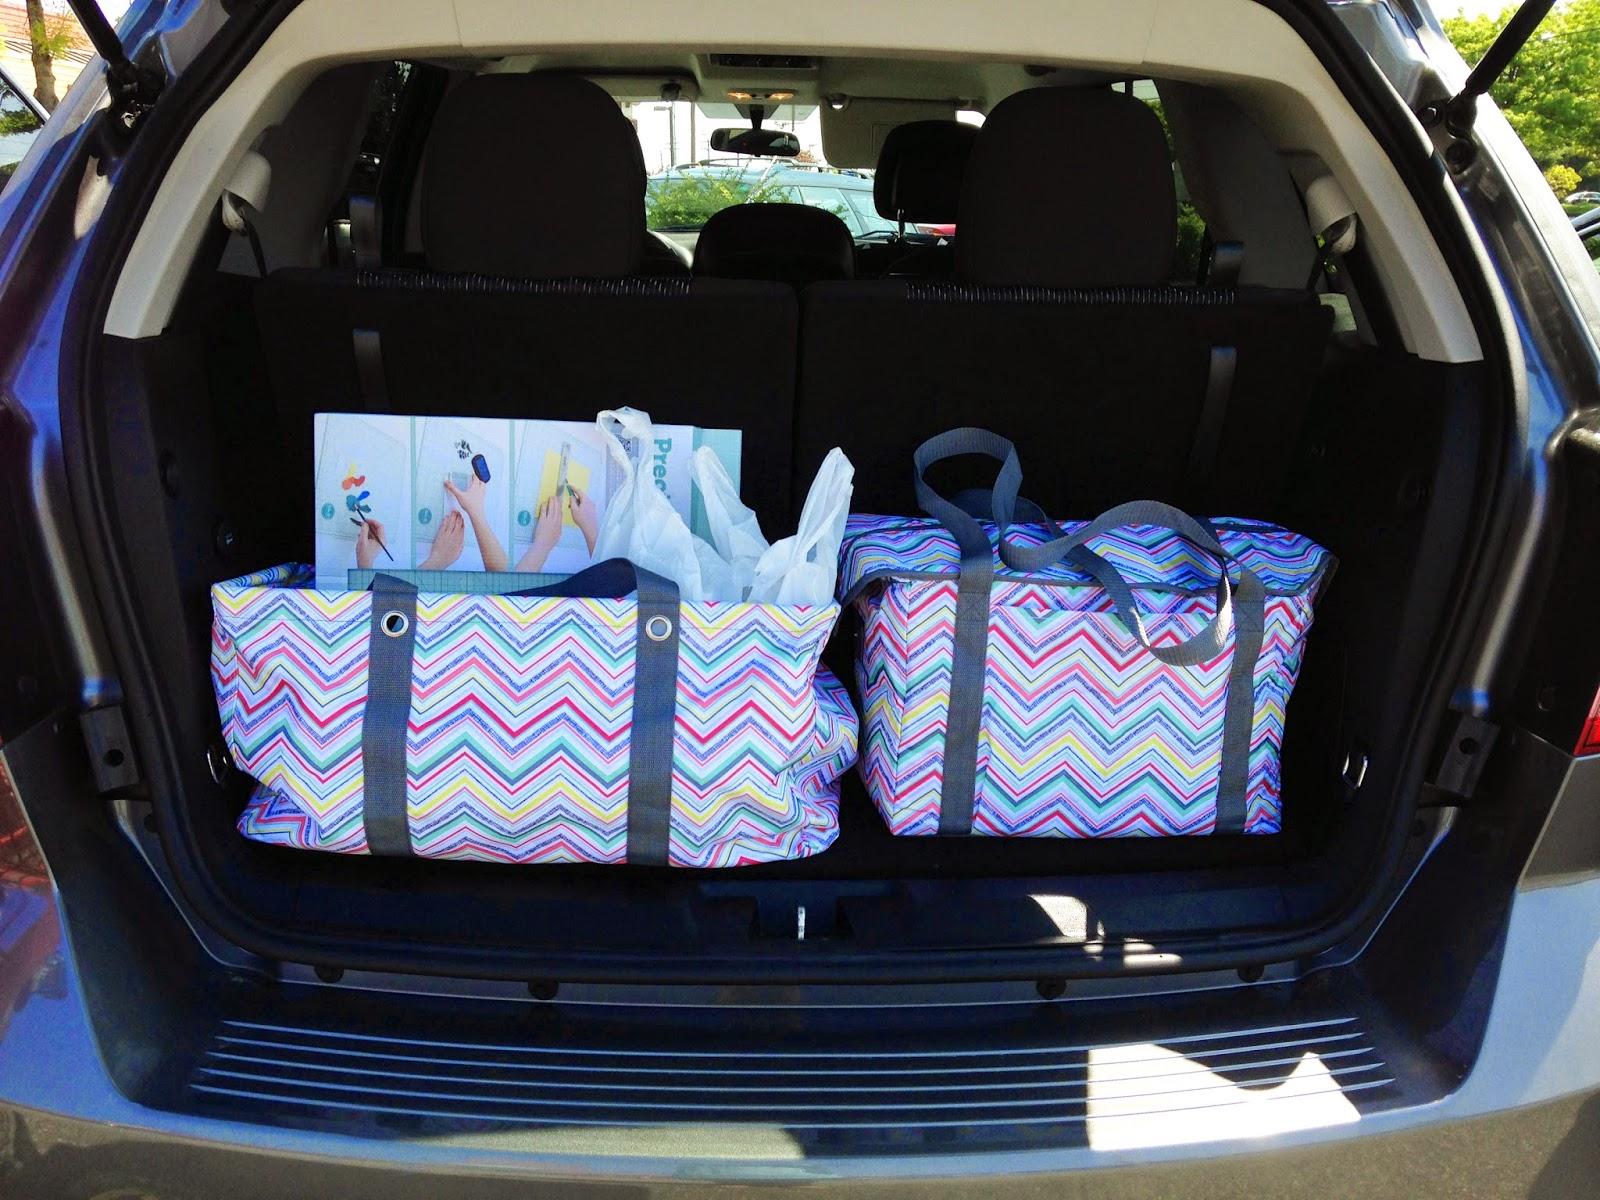 Suv With Third Row >> Seriously, Sabrina?: Car Organization and Shopping with ...